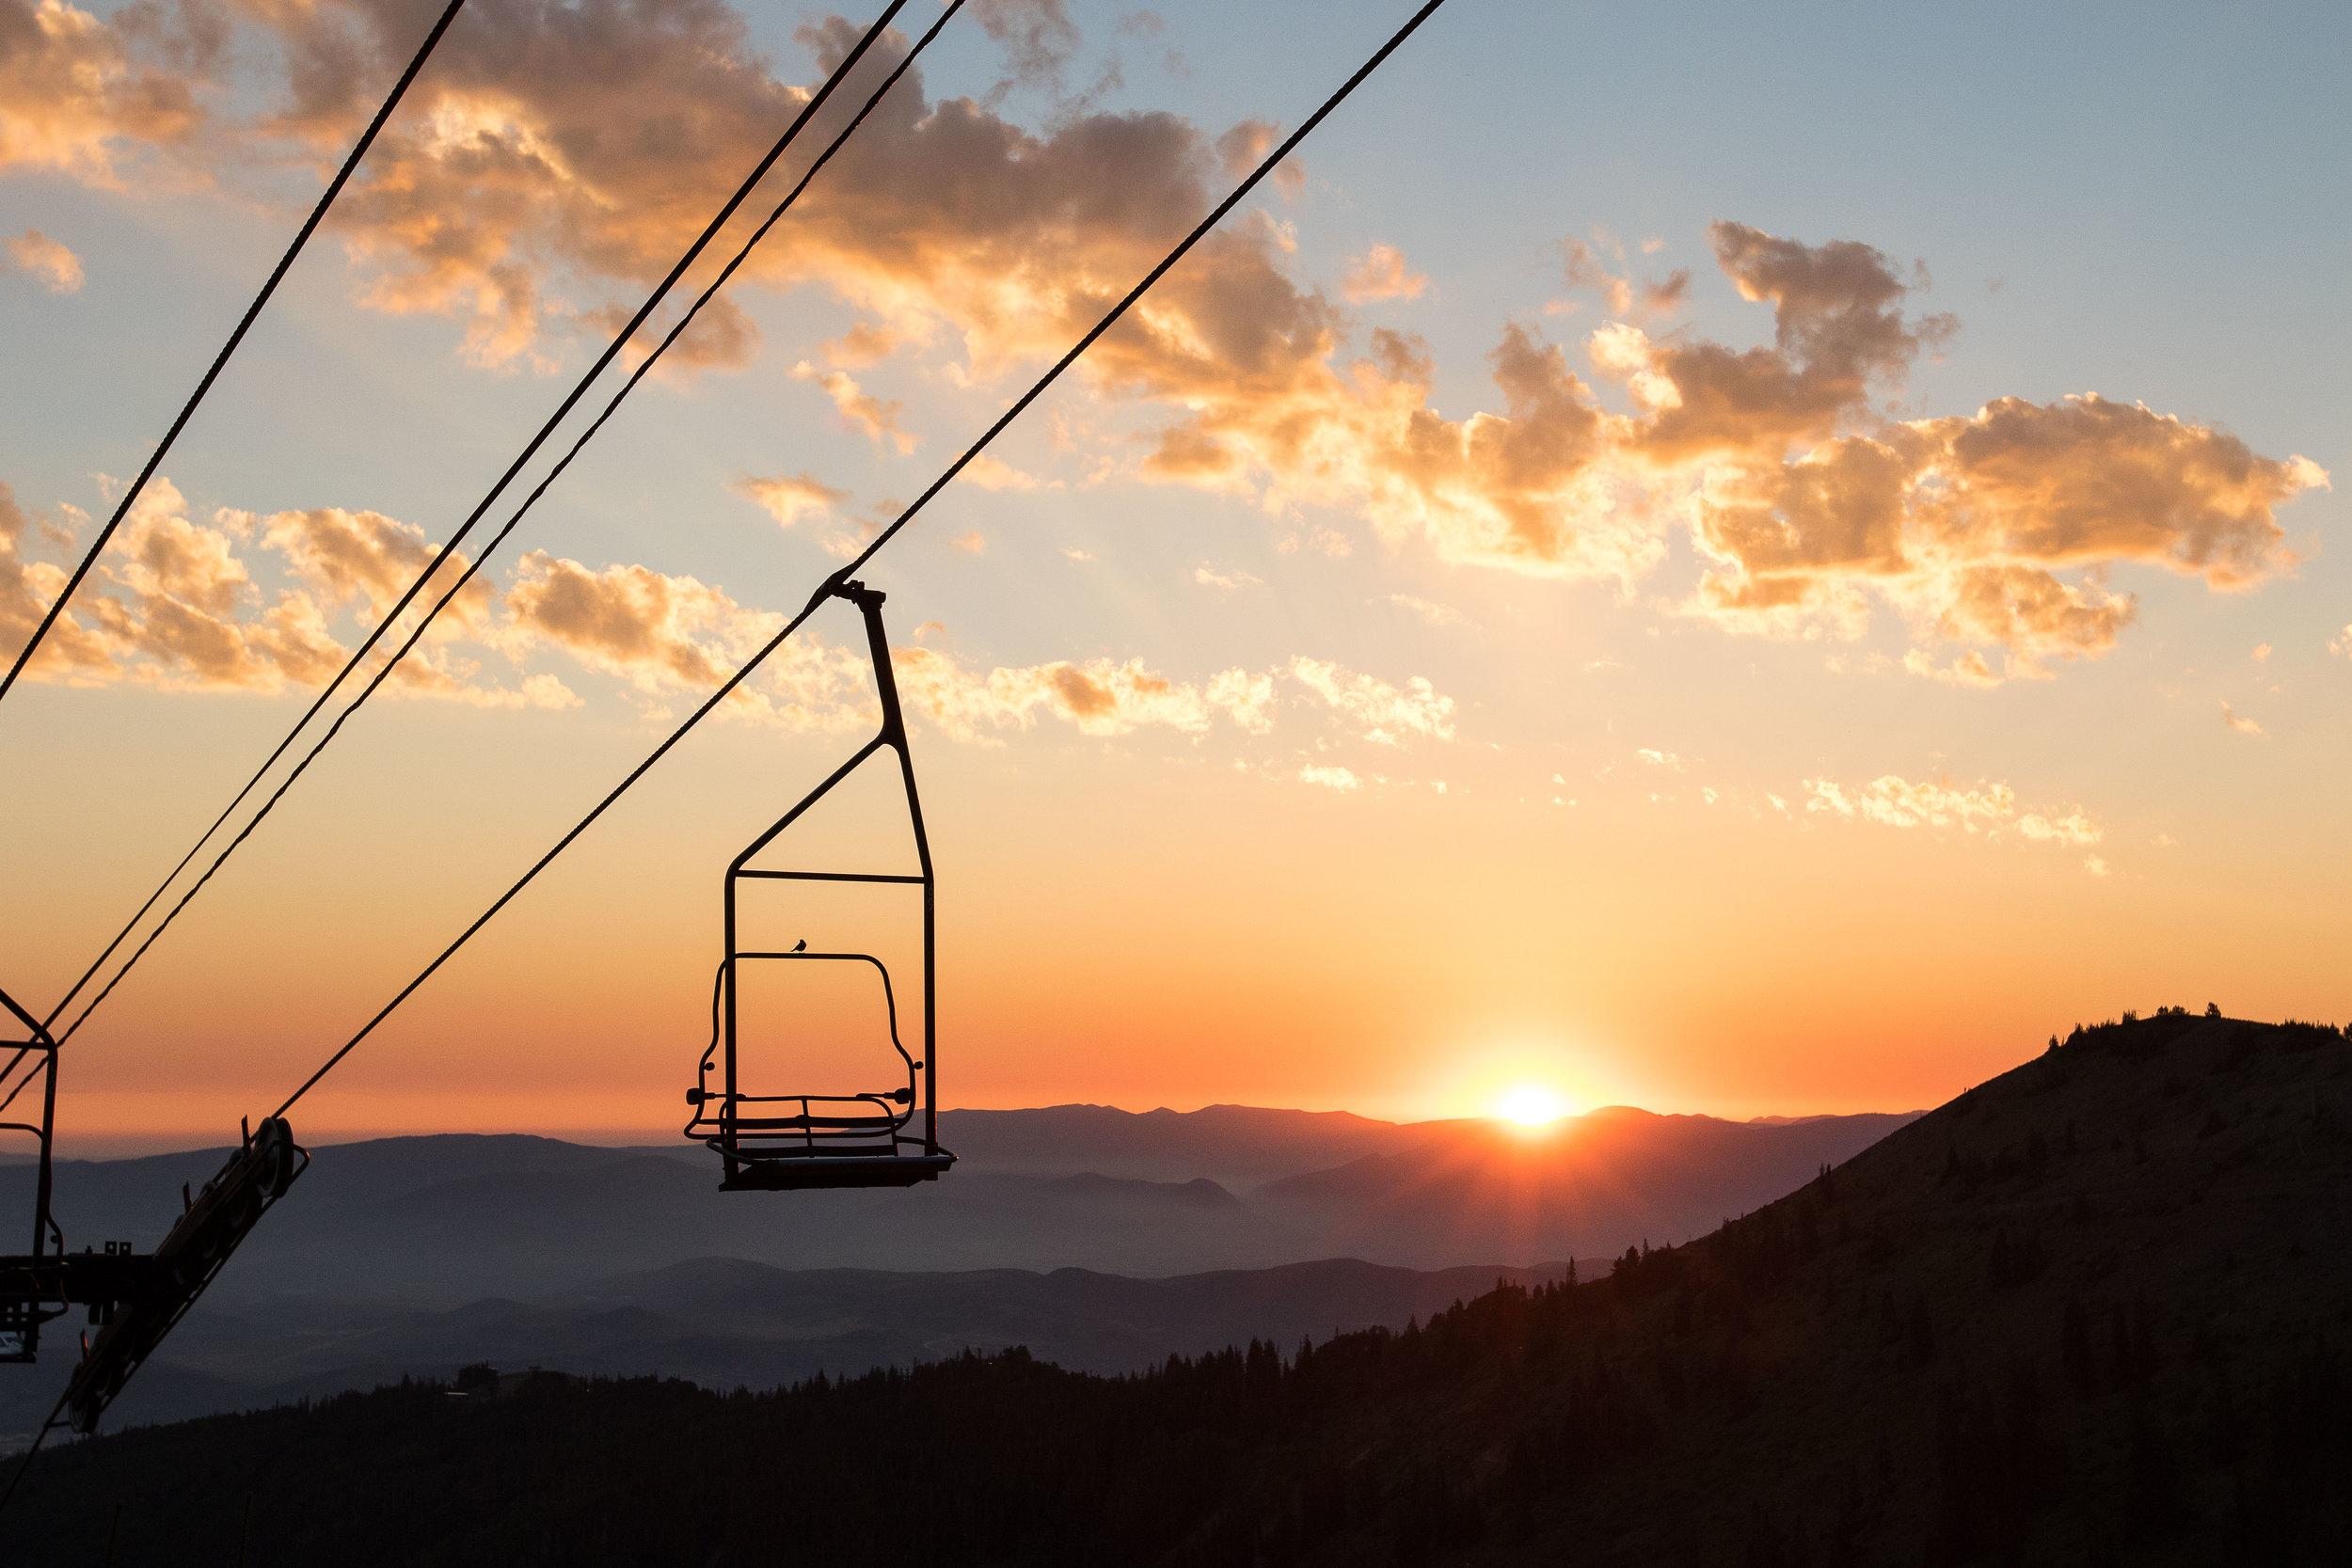 2016 - Sunrise at the top of Jupiter Lift